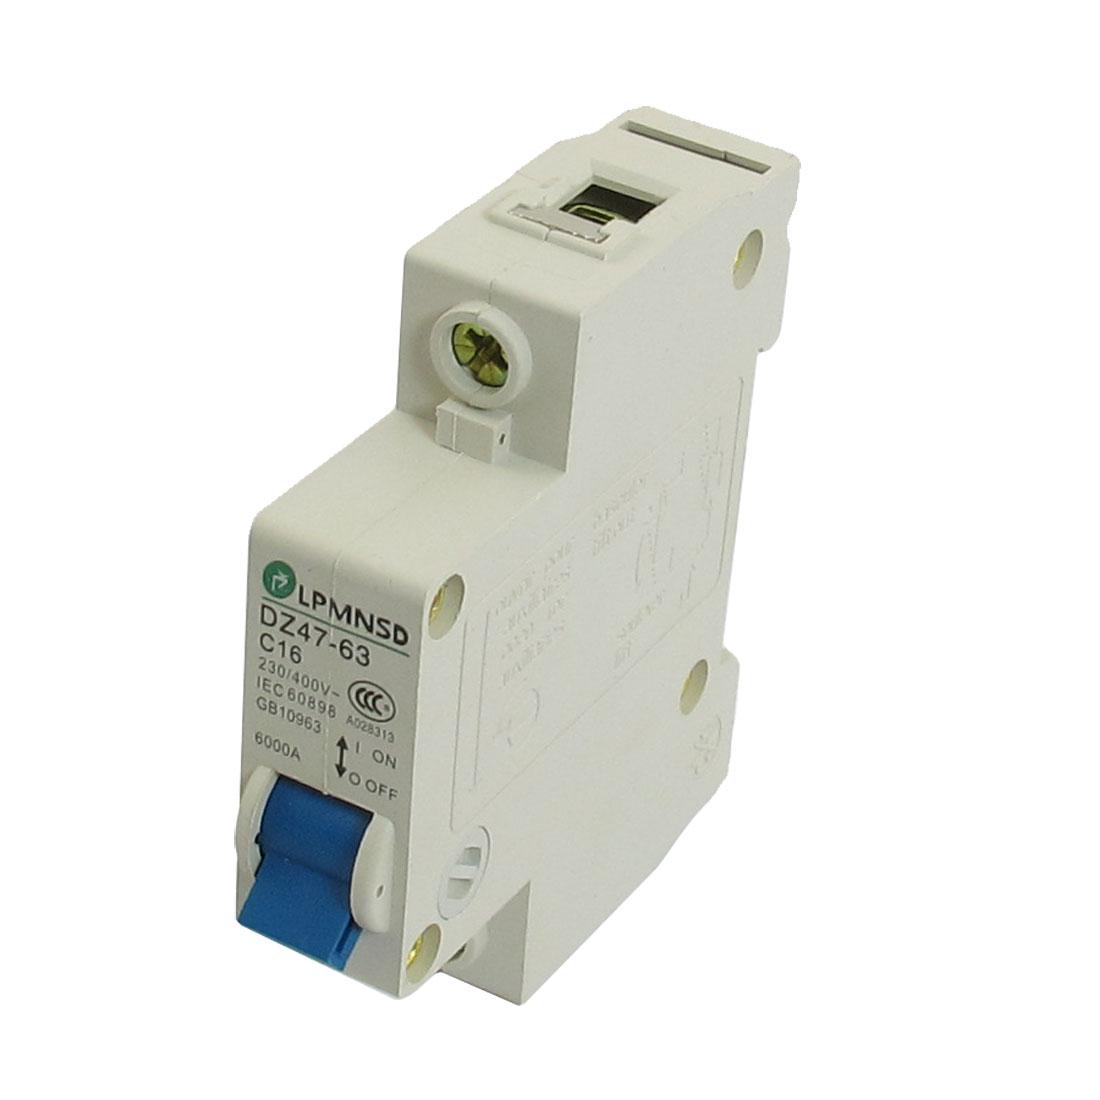 DZ47-63 C16 16A 230/400VAC 6000A Breaking Capacity 1 Poles Circuit Breaker